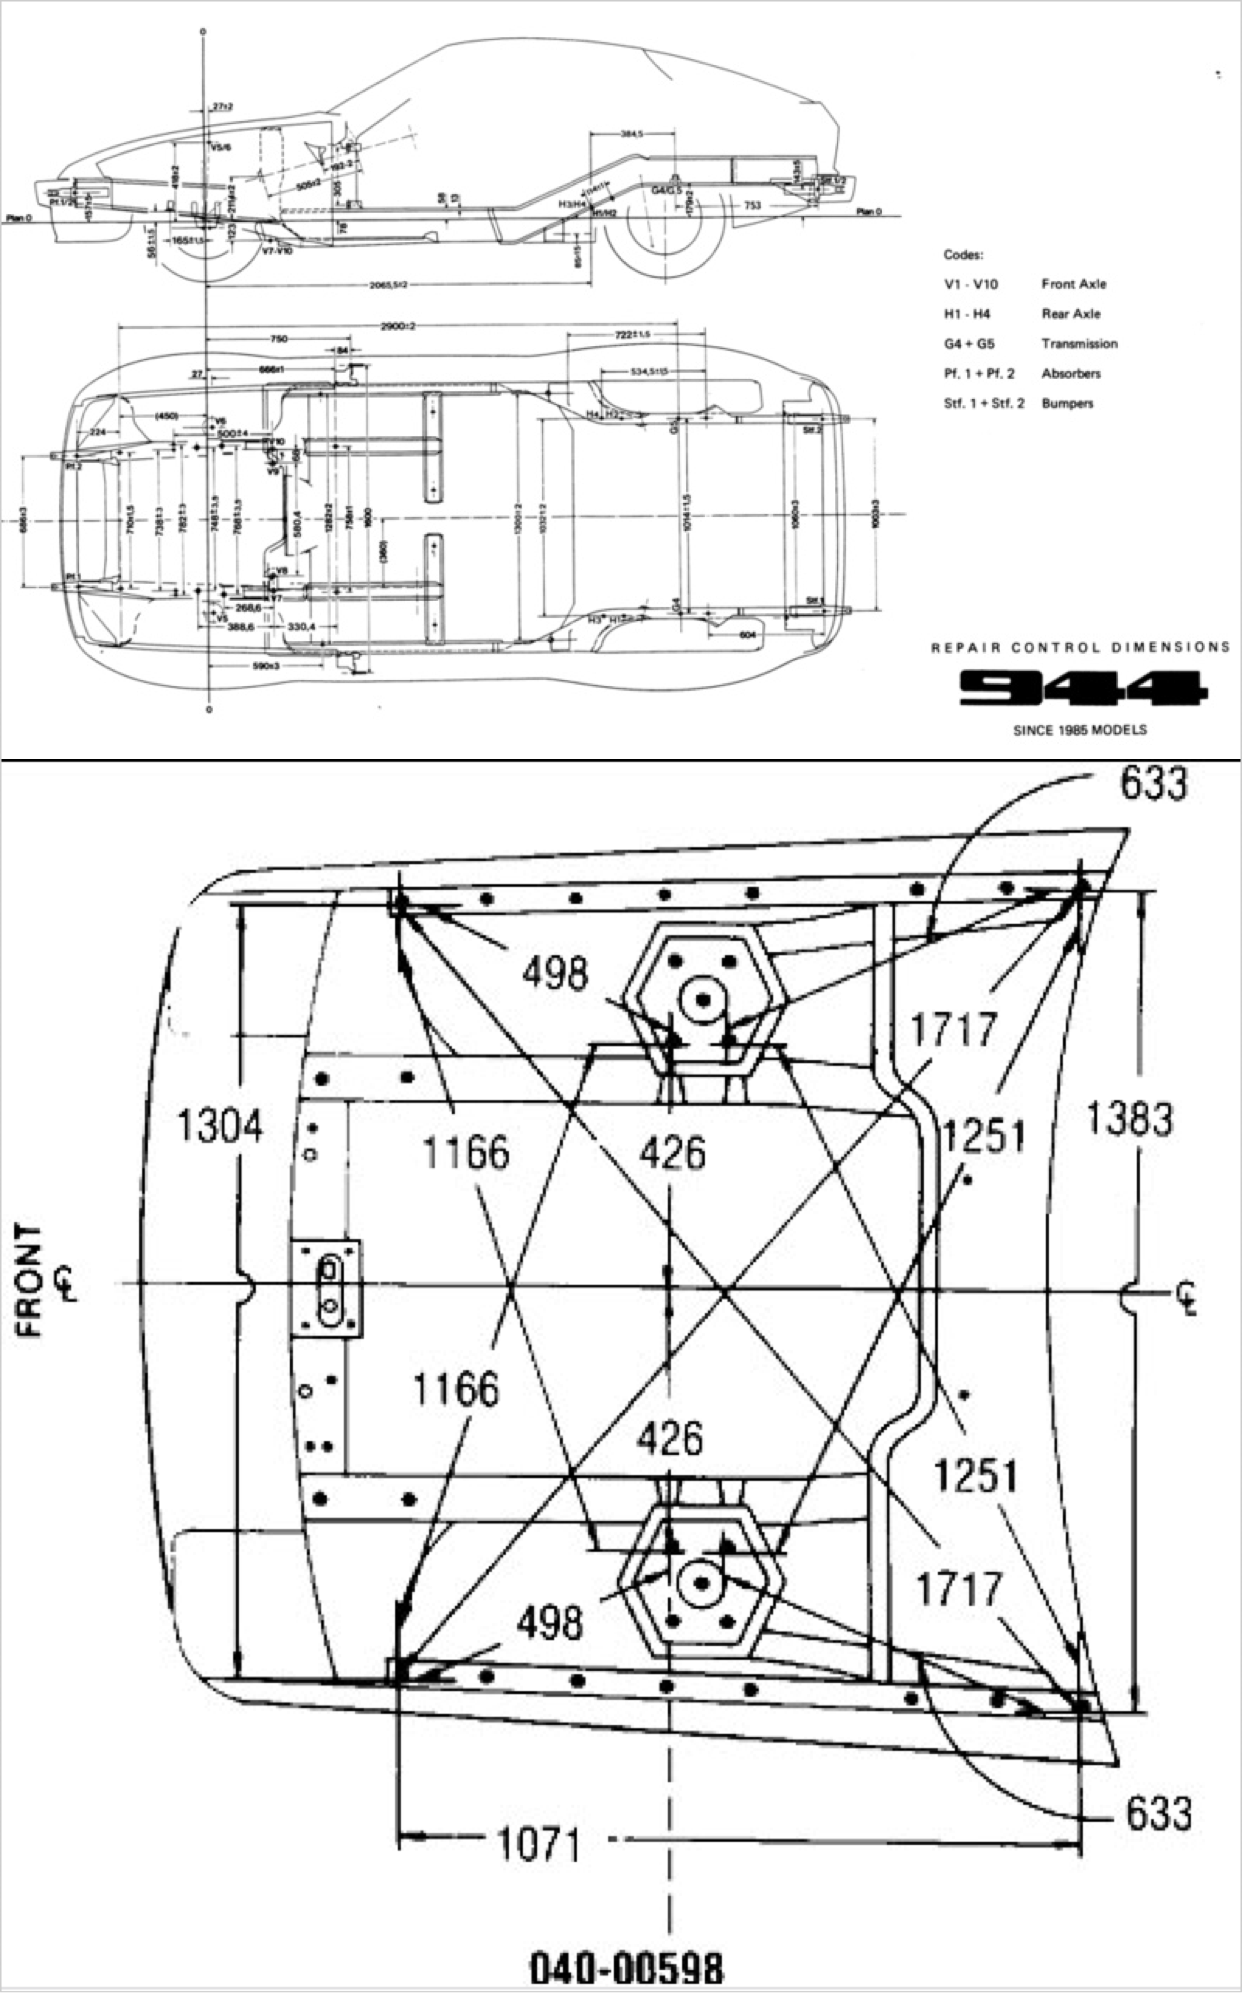 hight resolution of porsche 944 repair control dimensions front detail porsche porsche 911 engine diagram further porsche 924 transmission diagram